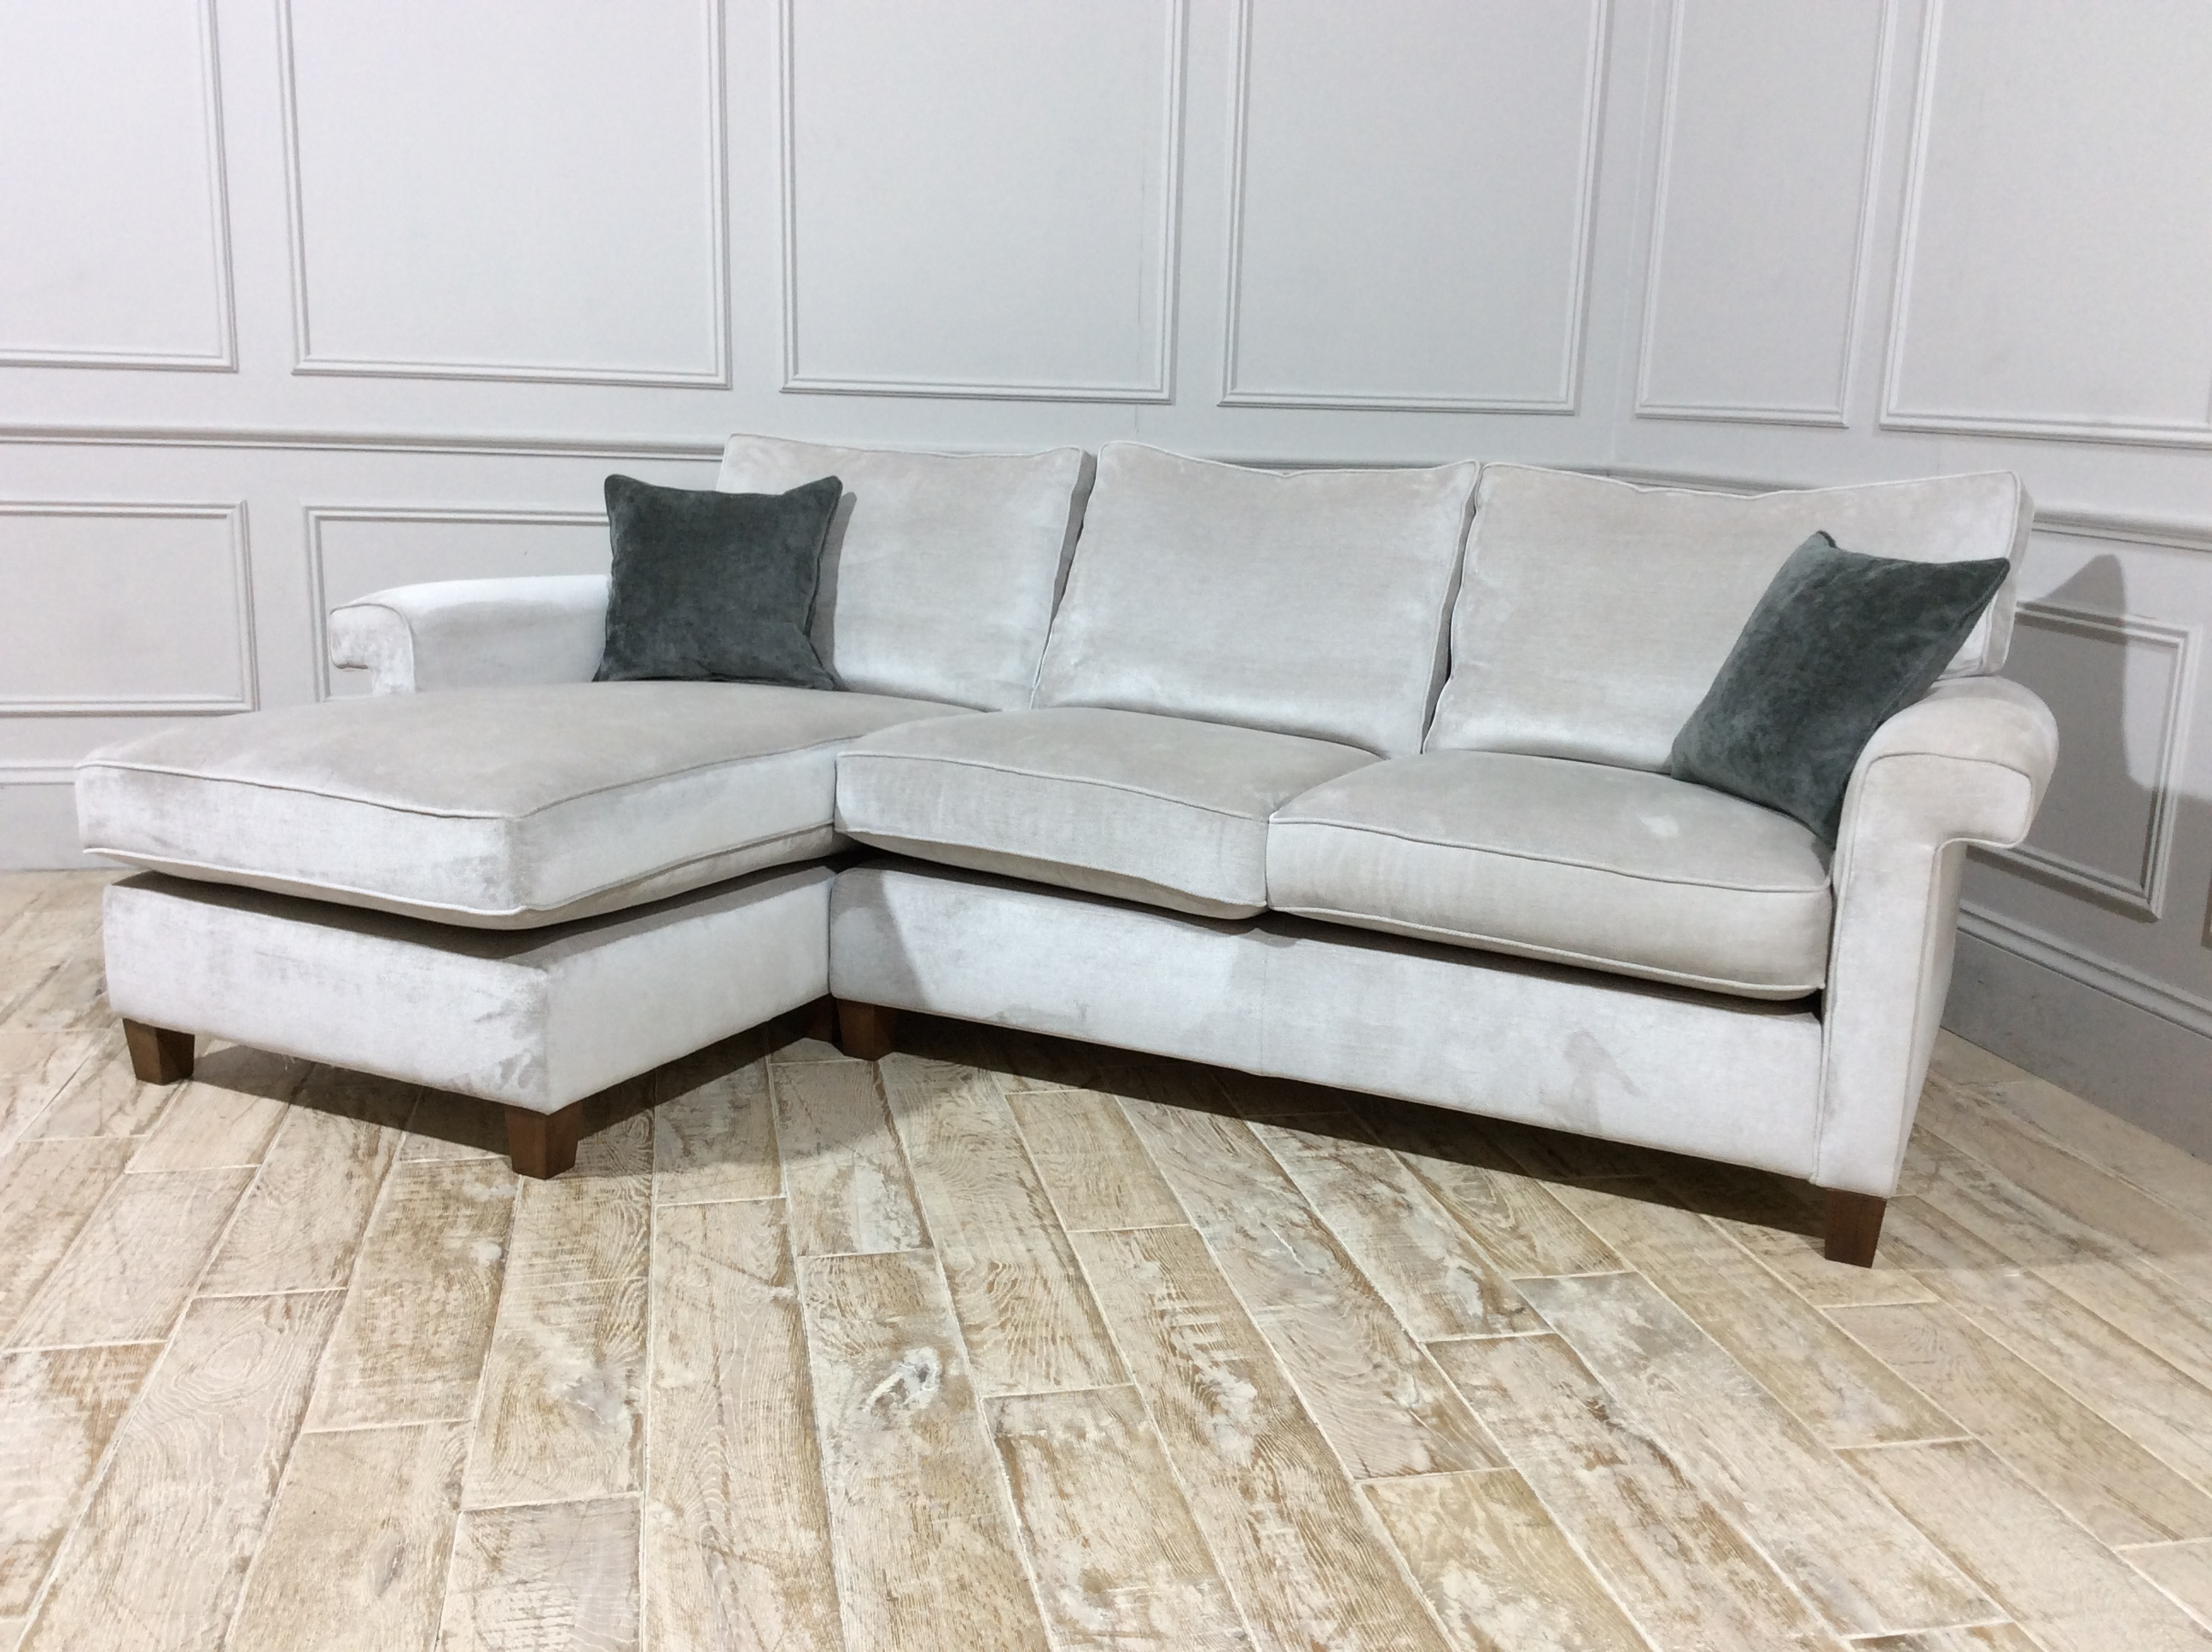 Duresta Haywood Chaise Sofa in Dolce Magnesium